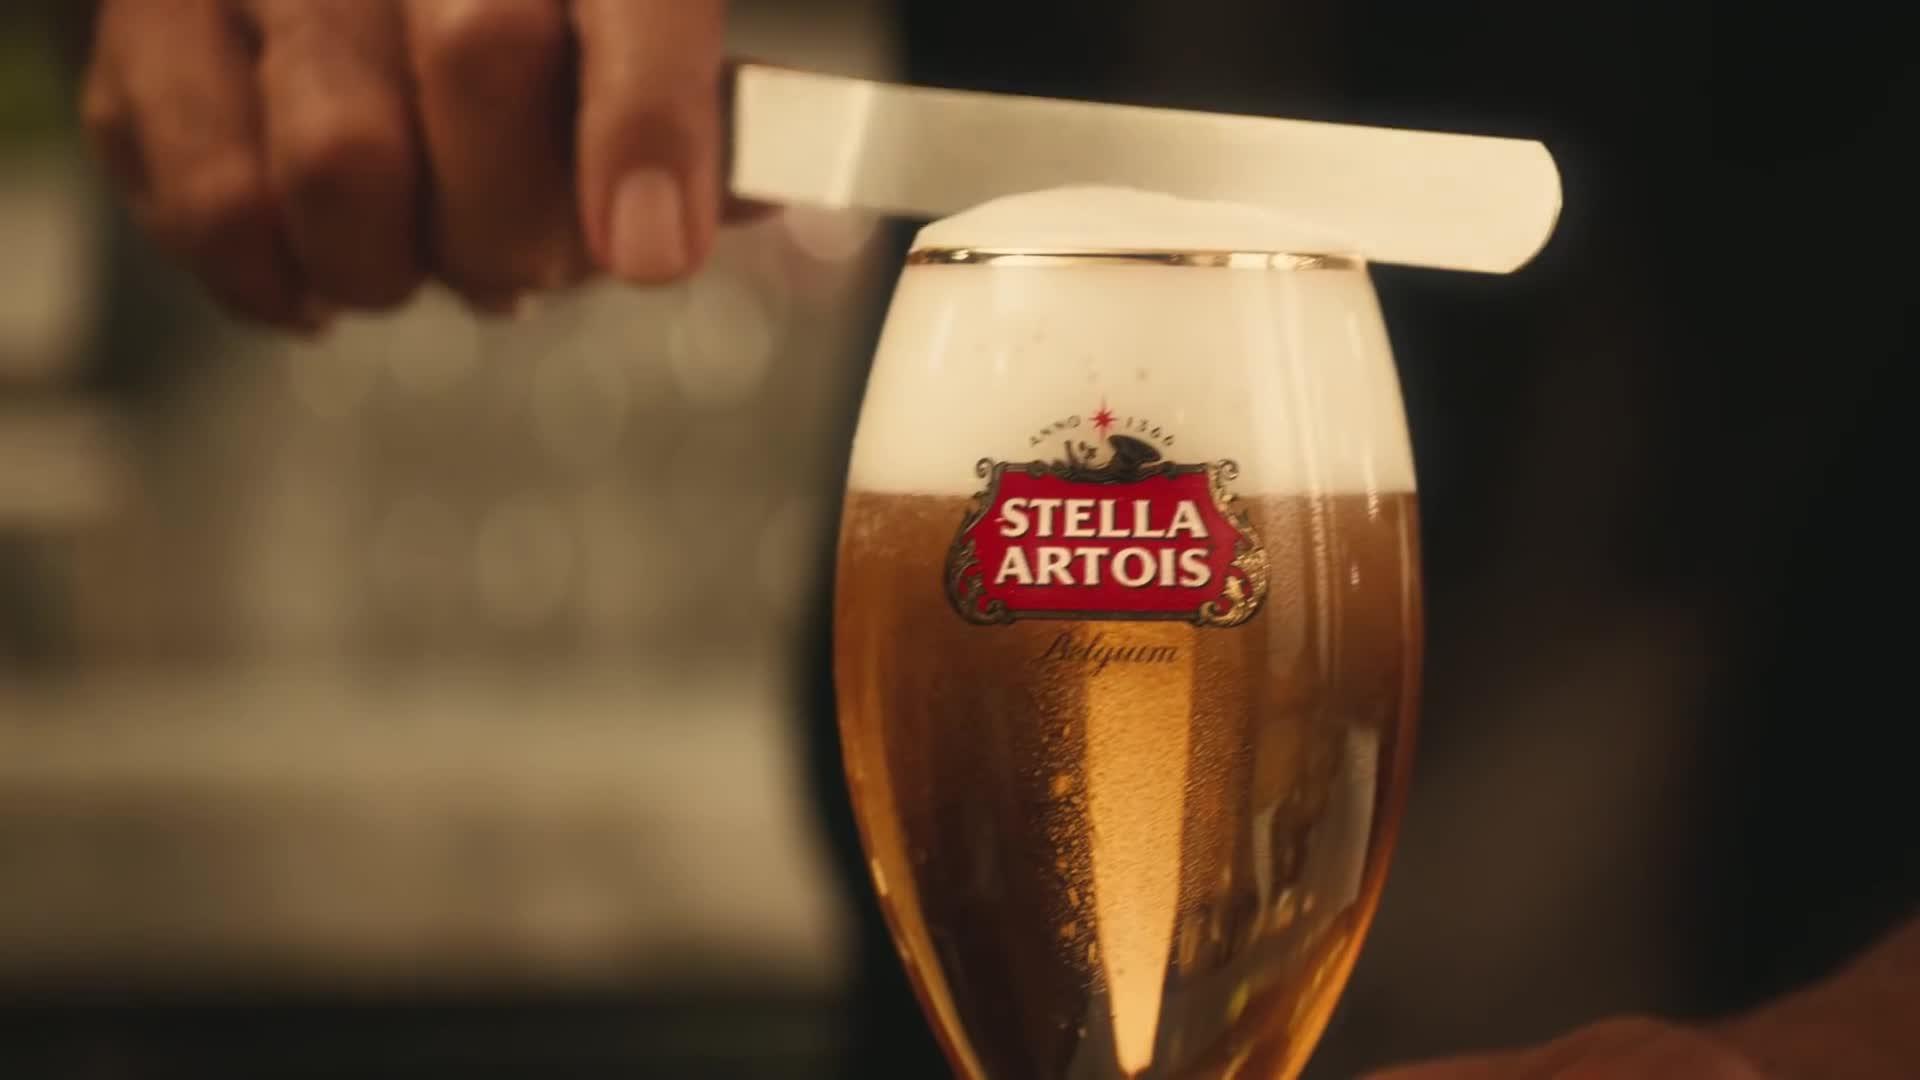 Werbespot, Super Bowl, Super Bowl 2019, bier